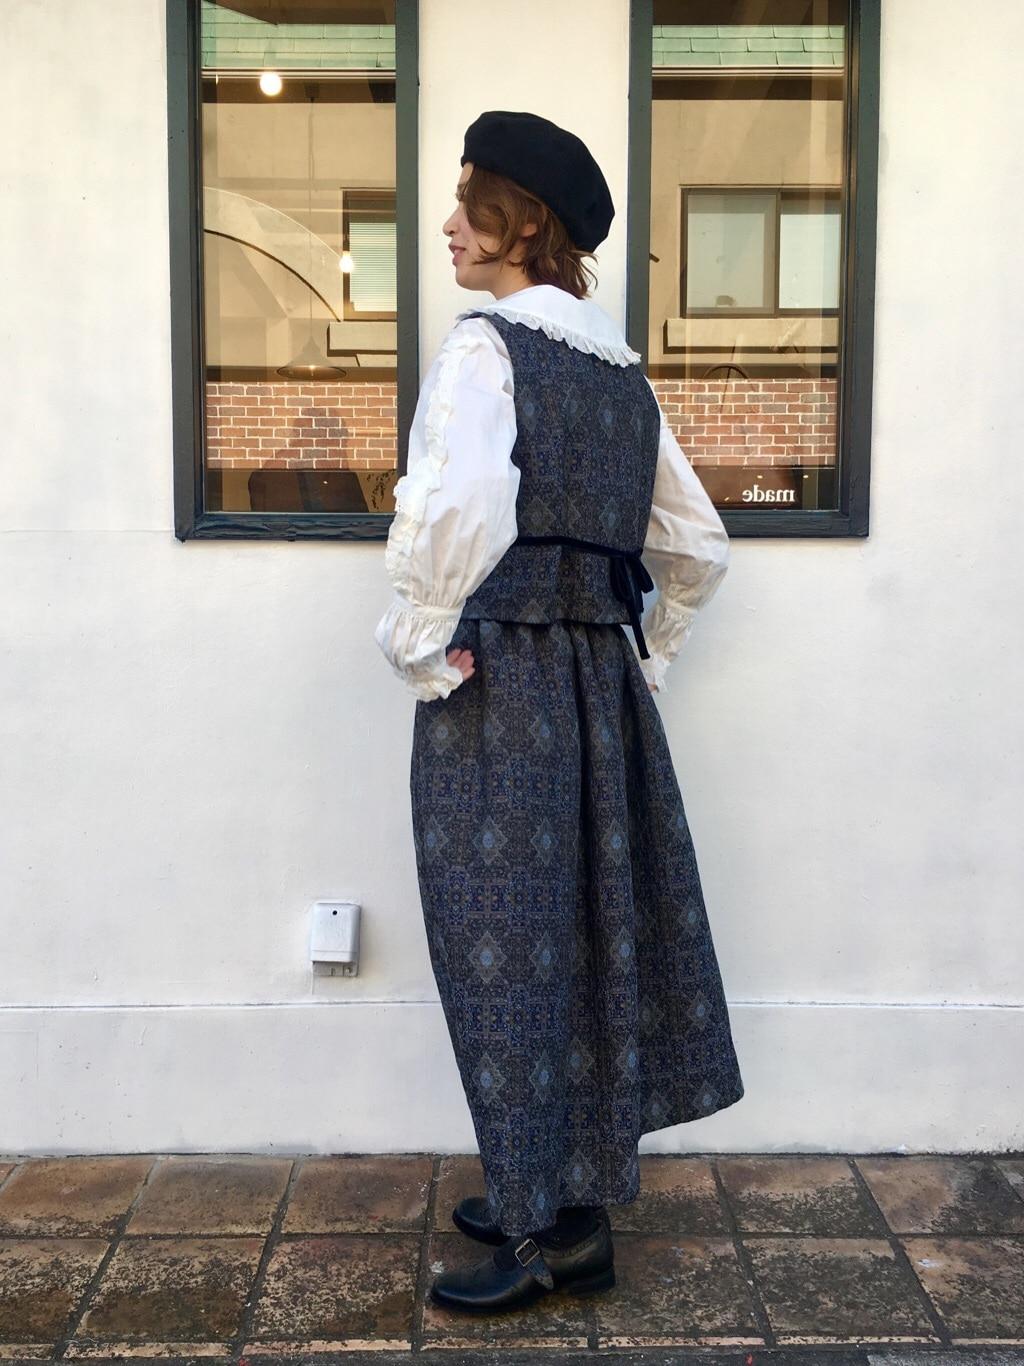 chambre de charme 横浜ジョイナス 身長:160cm 2020.10.27